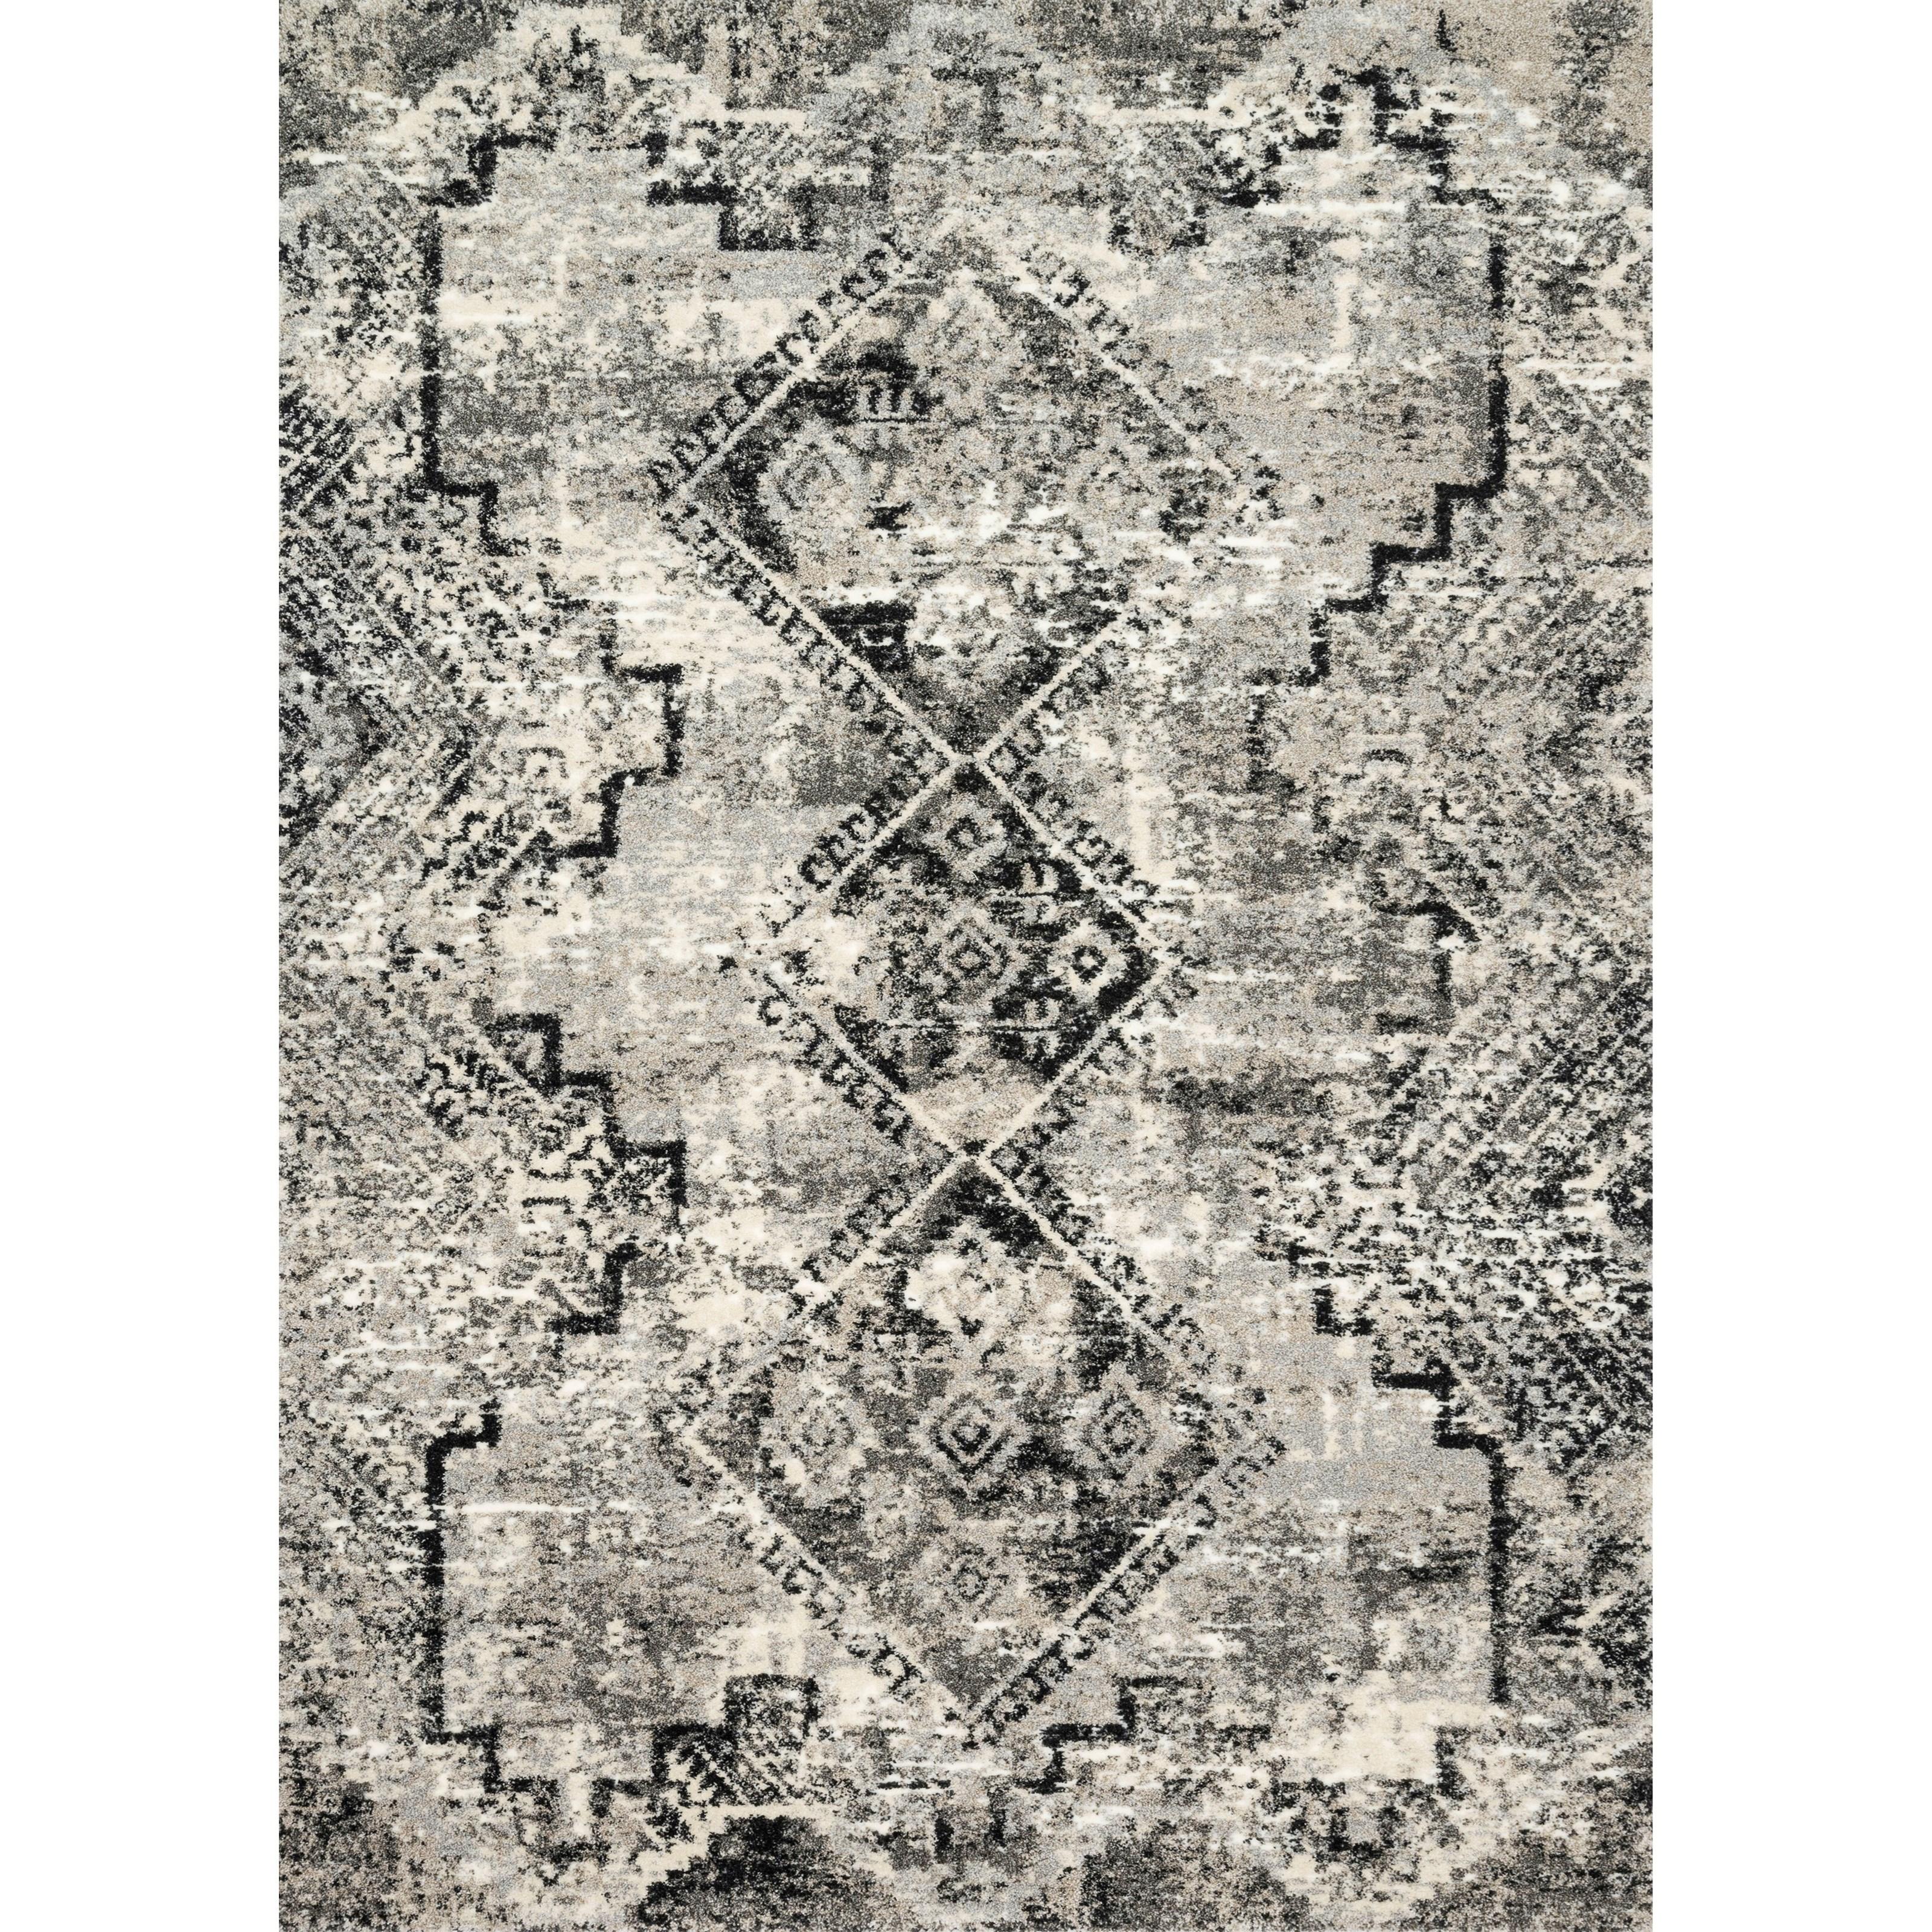 "Viera 1'6"" x 1'6""  Grey / Black Rug by Loloi Rugs at Sprintz Furniture"